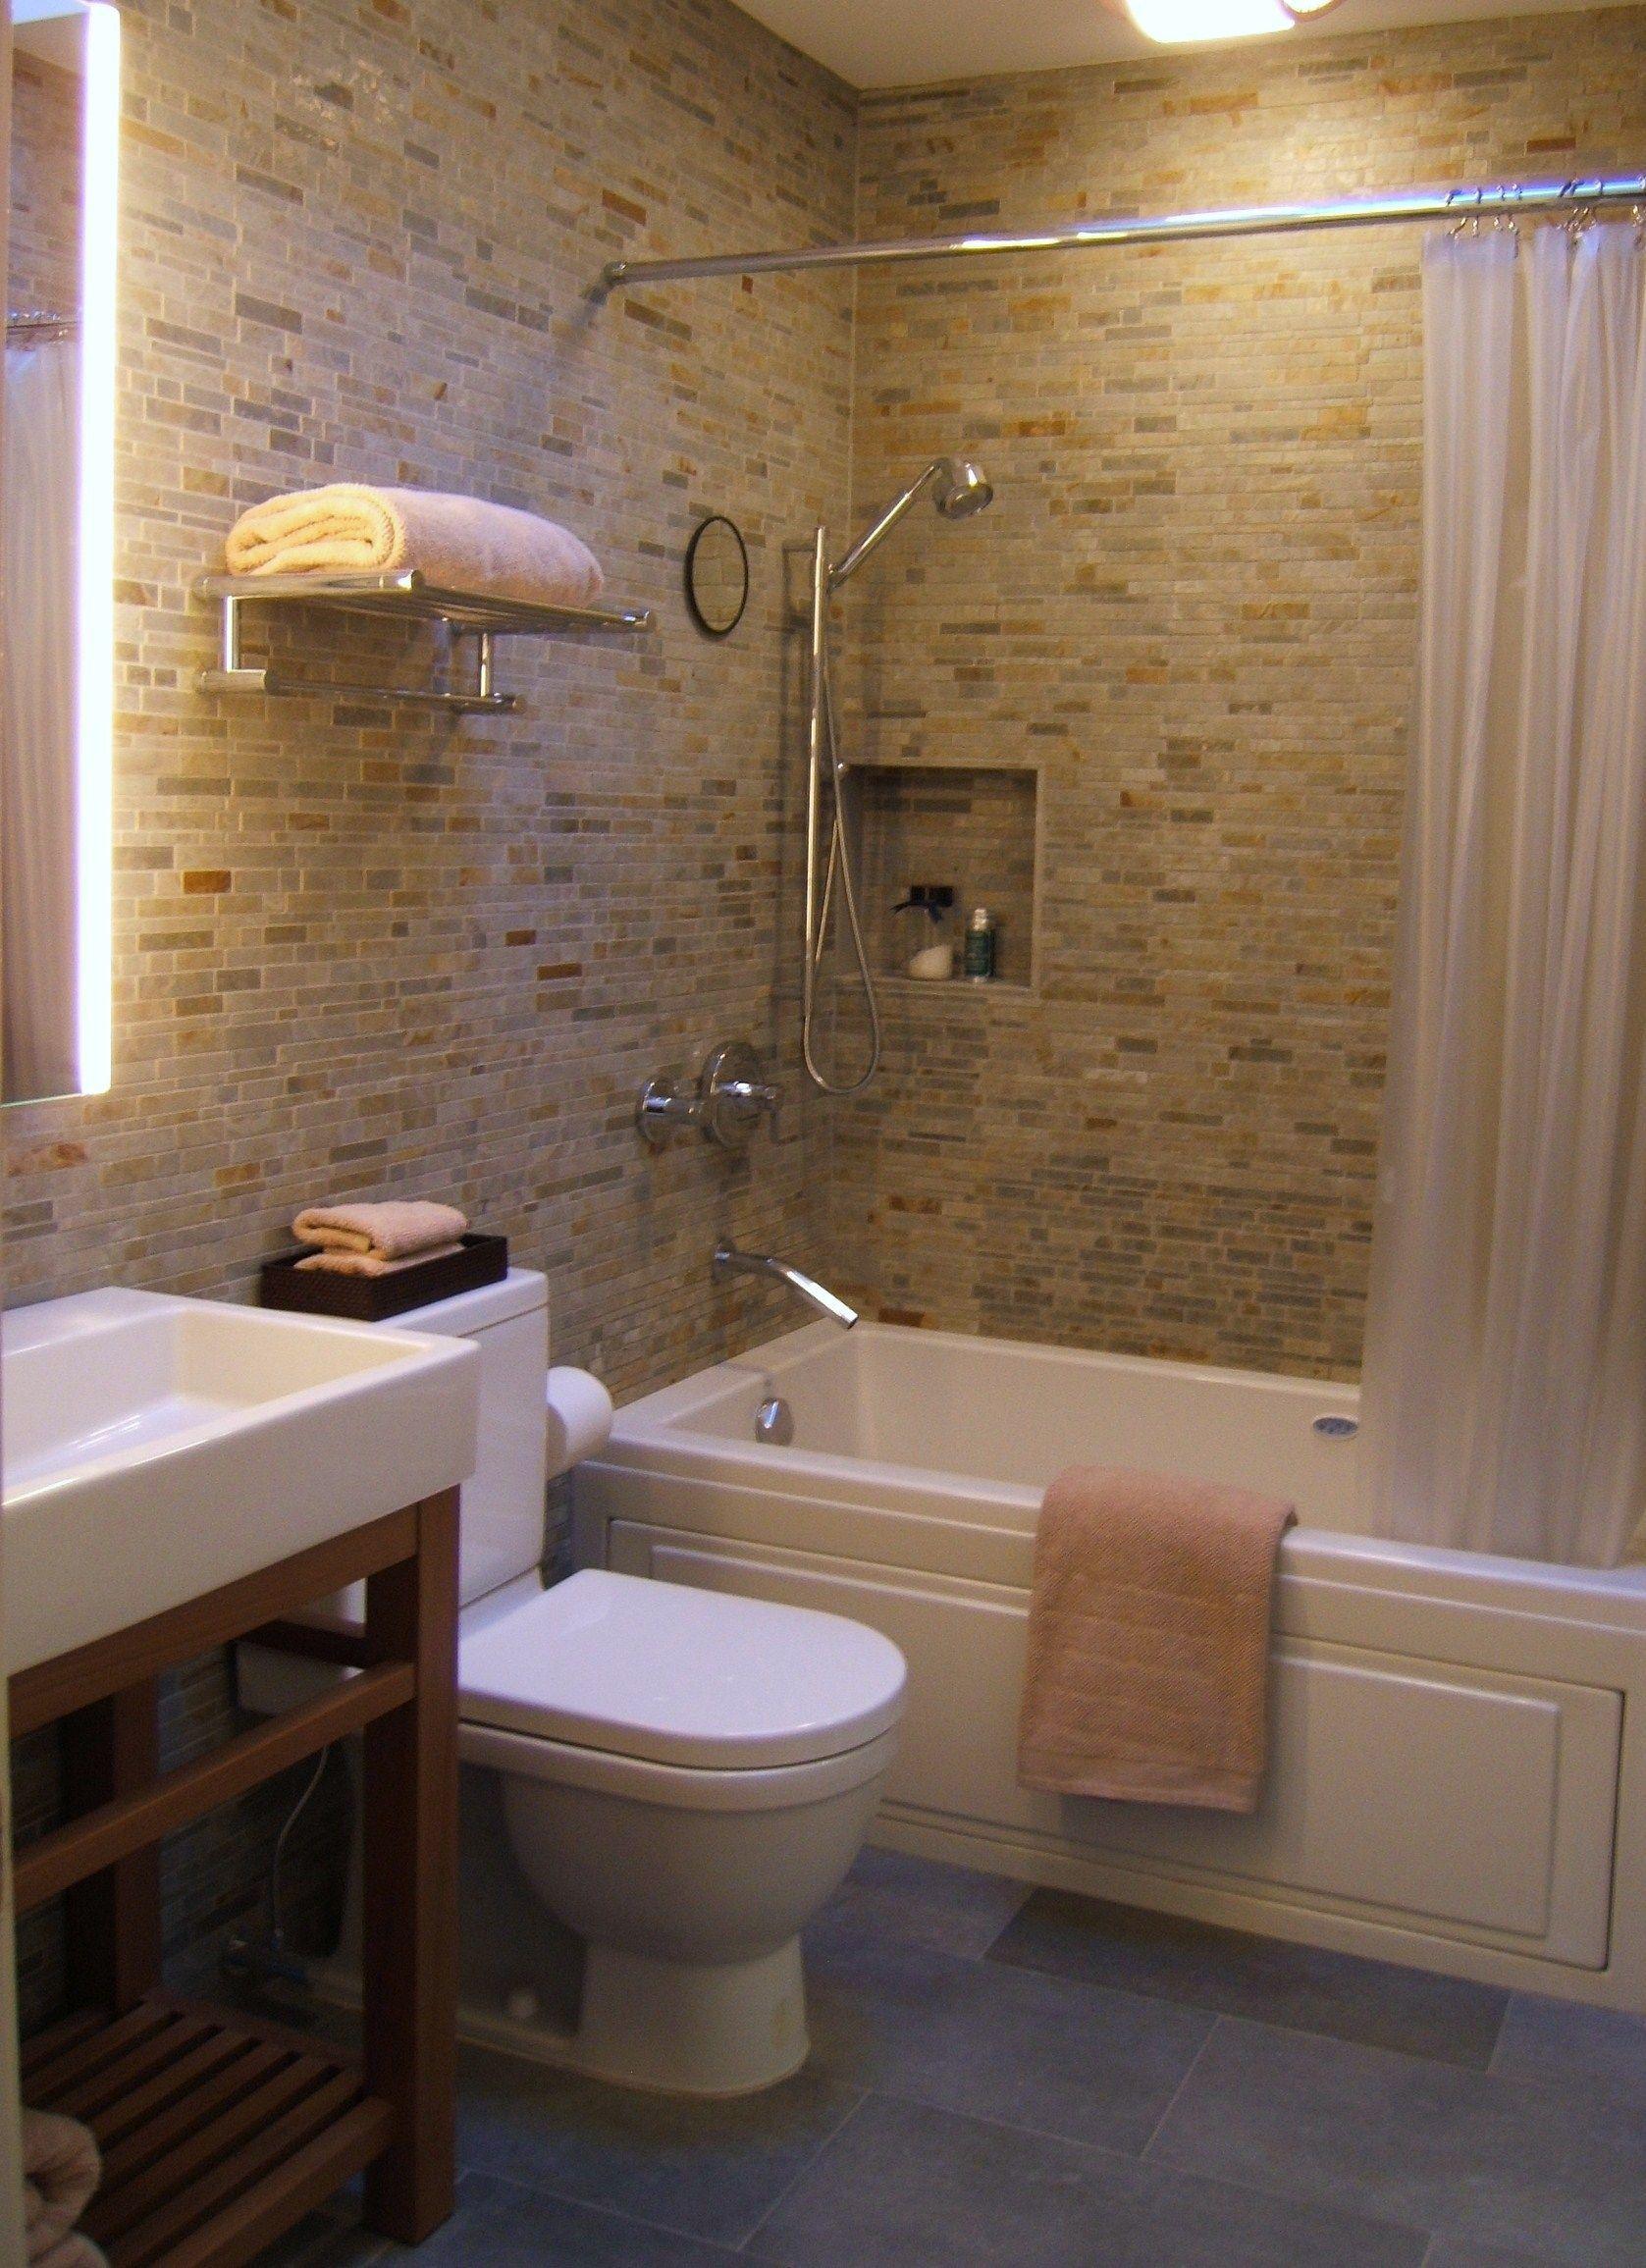 95 Bathroom Ideas South Africa Africa Bathroom Ideas South Bathroom Renovation Trends Bathroom Design Layout Bathroom Layout